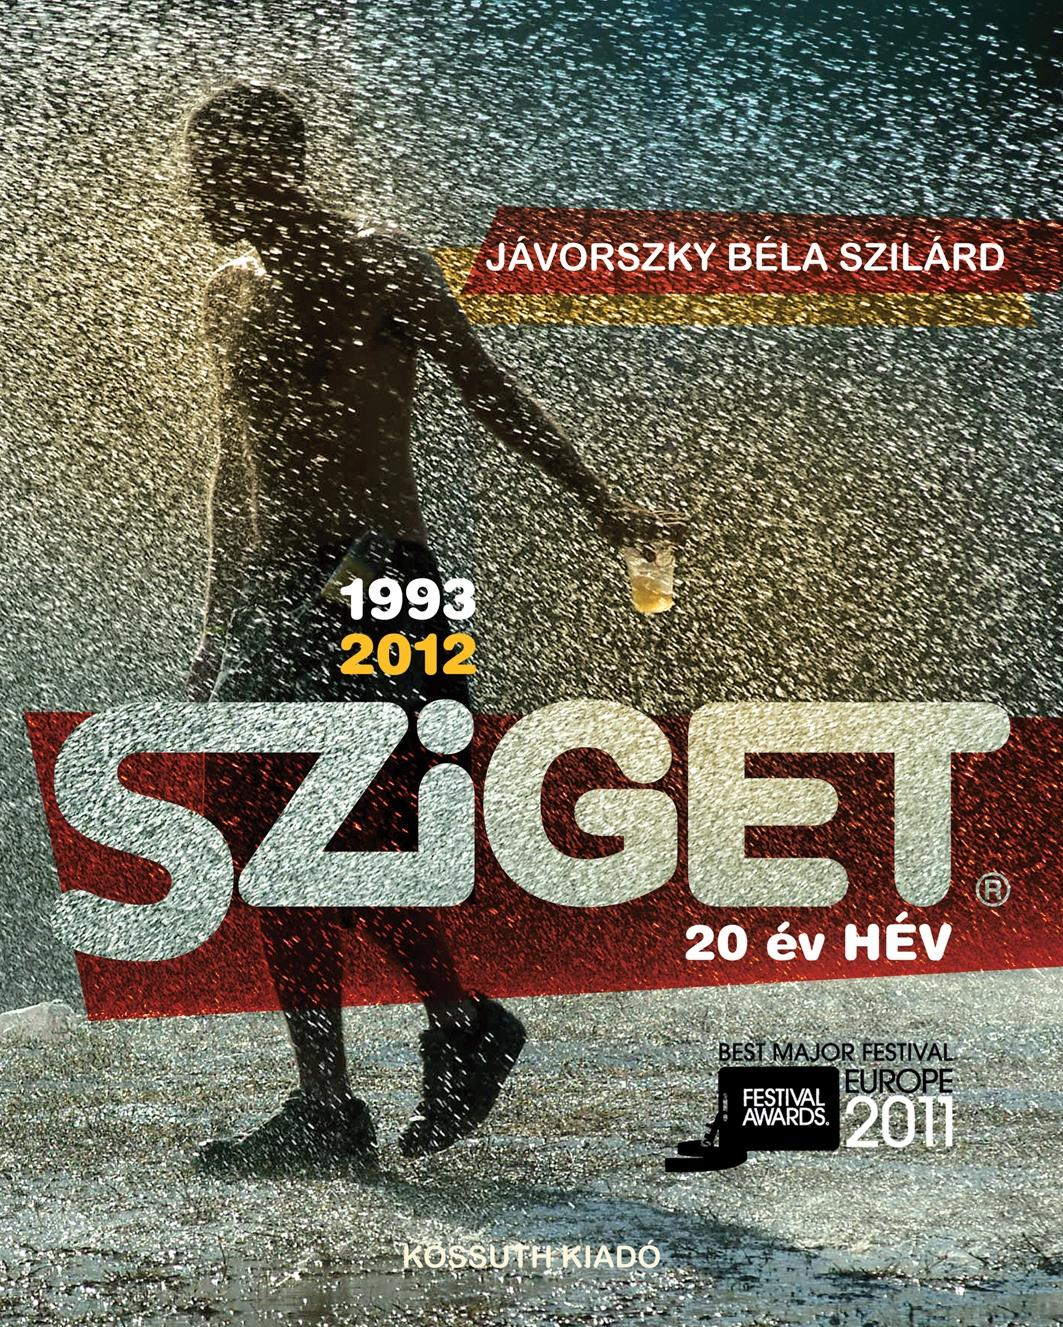 SZIGET 1993-2012 - 20 ÉV HÉV